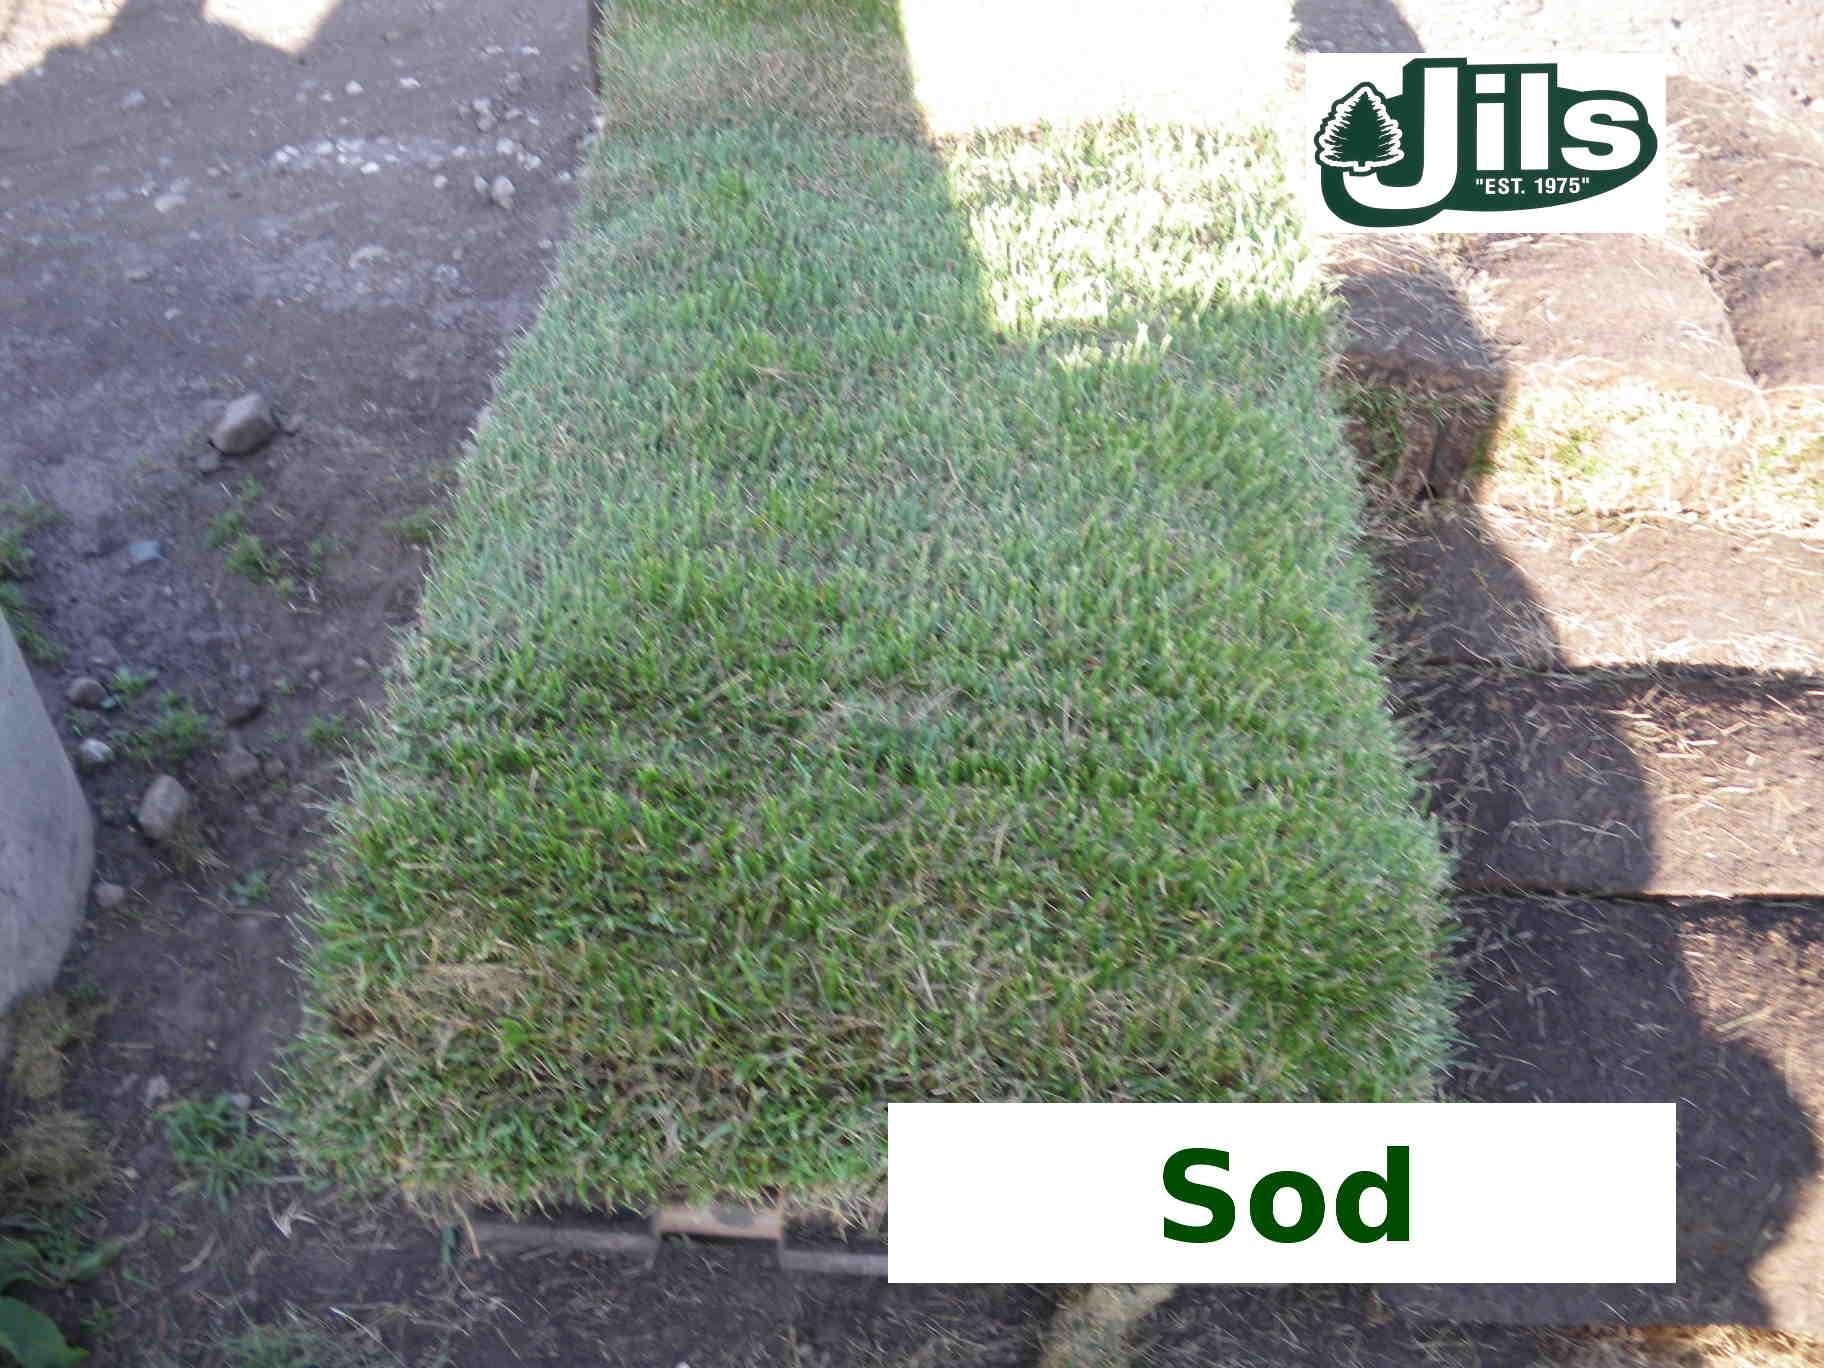 jils landscape supply   Edmonton   Sod & Other Landscape Products page